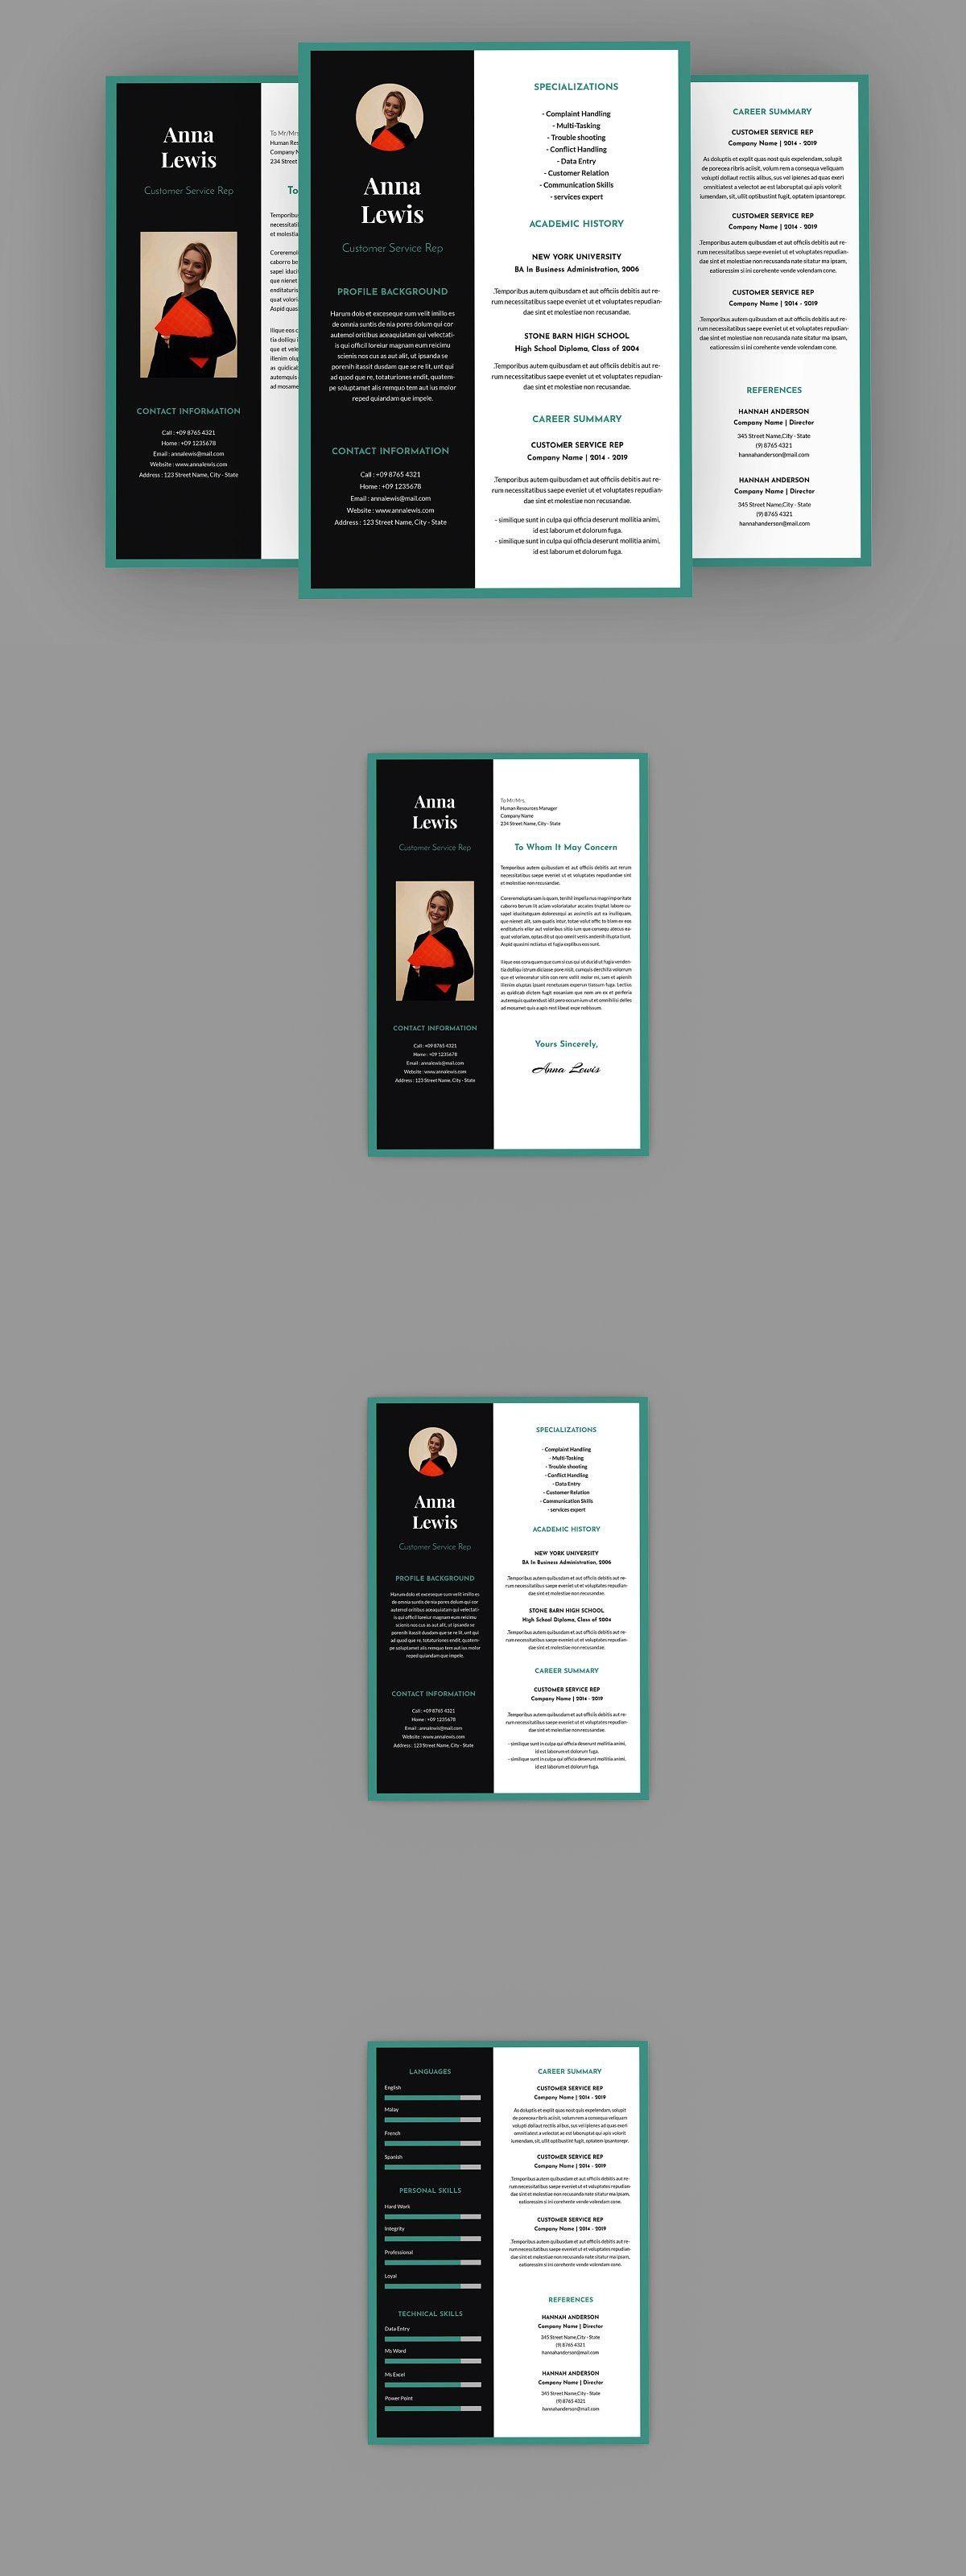 Blazing Resume Designer in 2020 Resume, Design